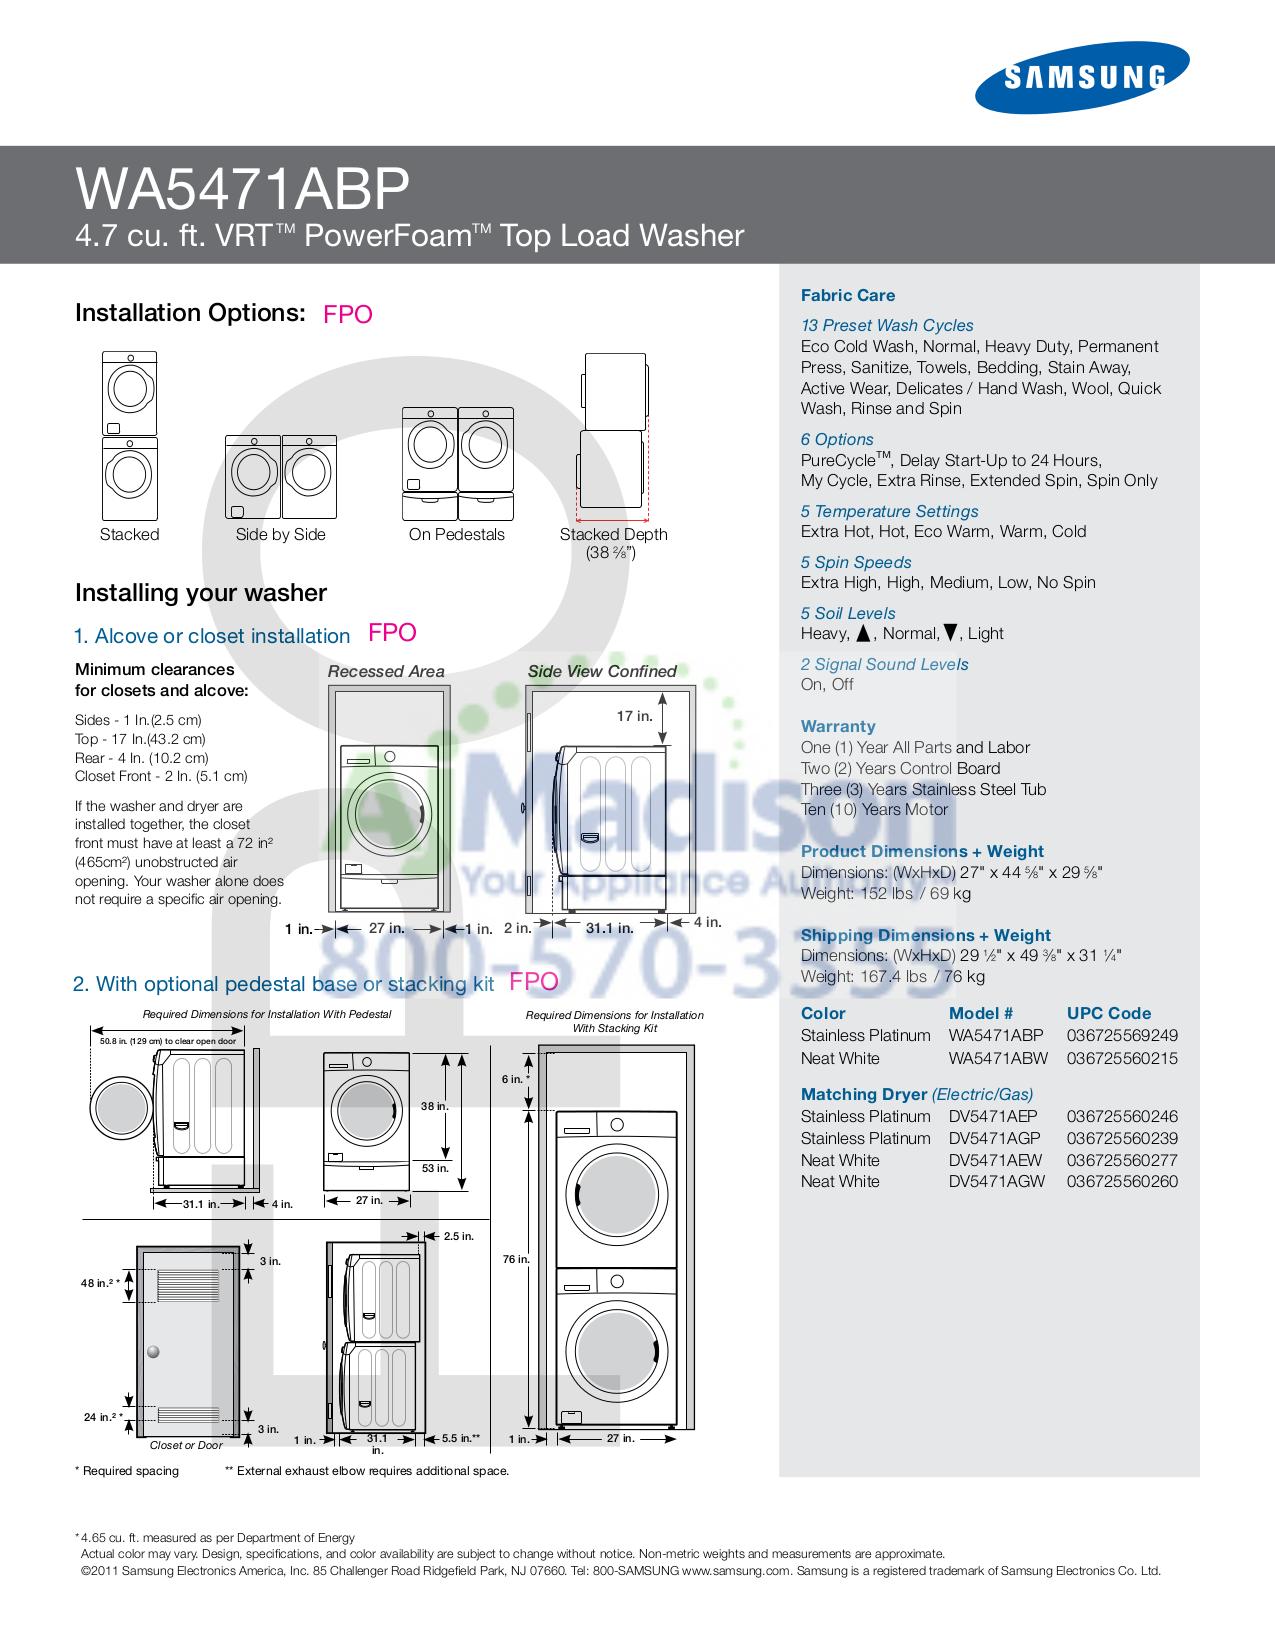 pdf manual for samsung washer wa5471abp